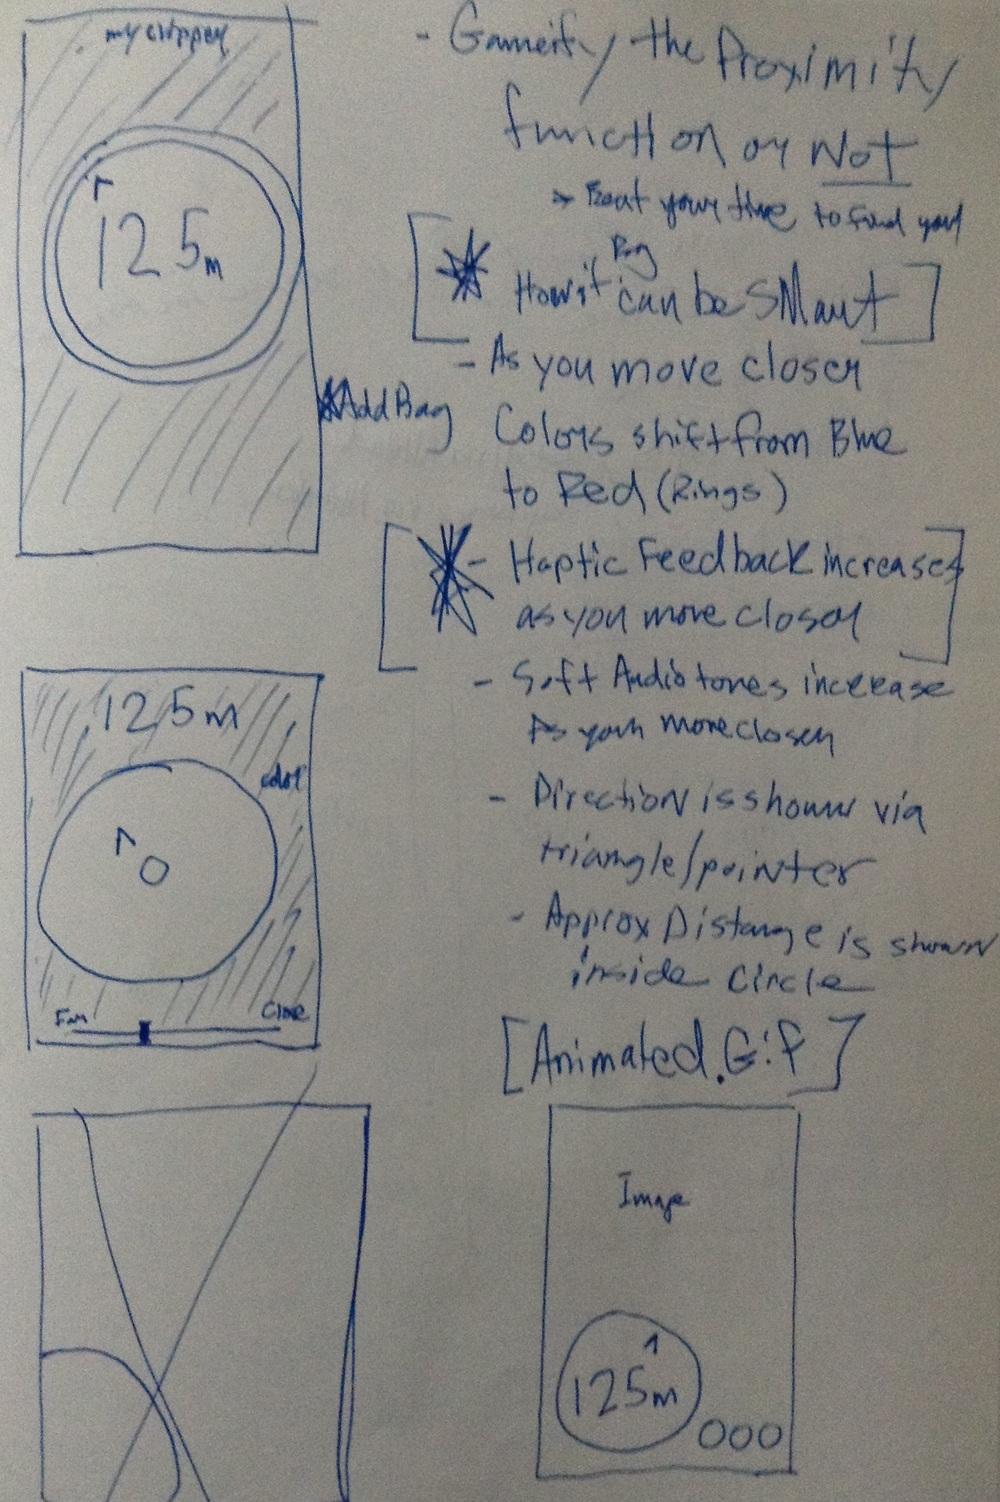 App UX Sketch 3